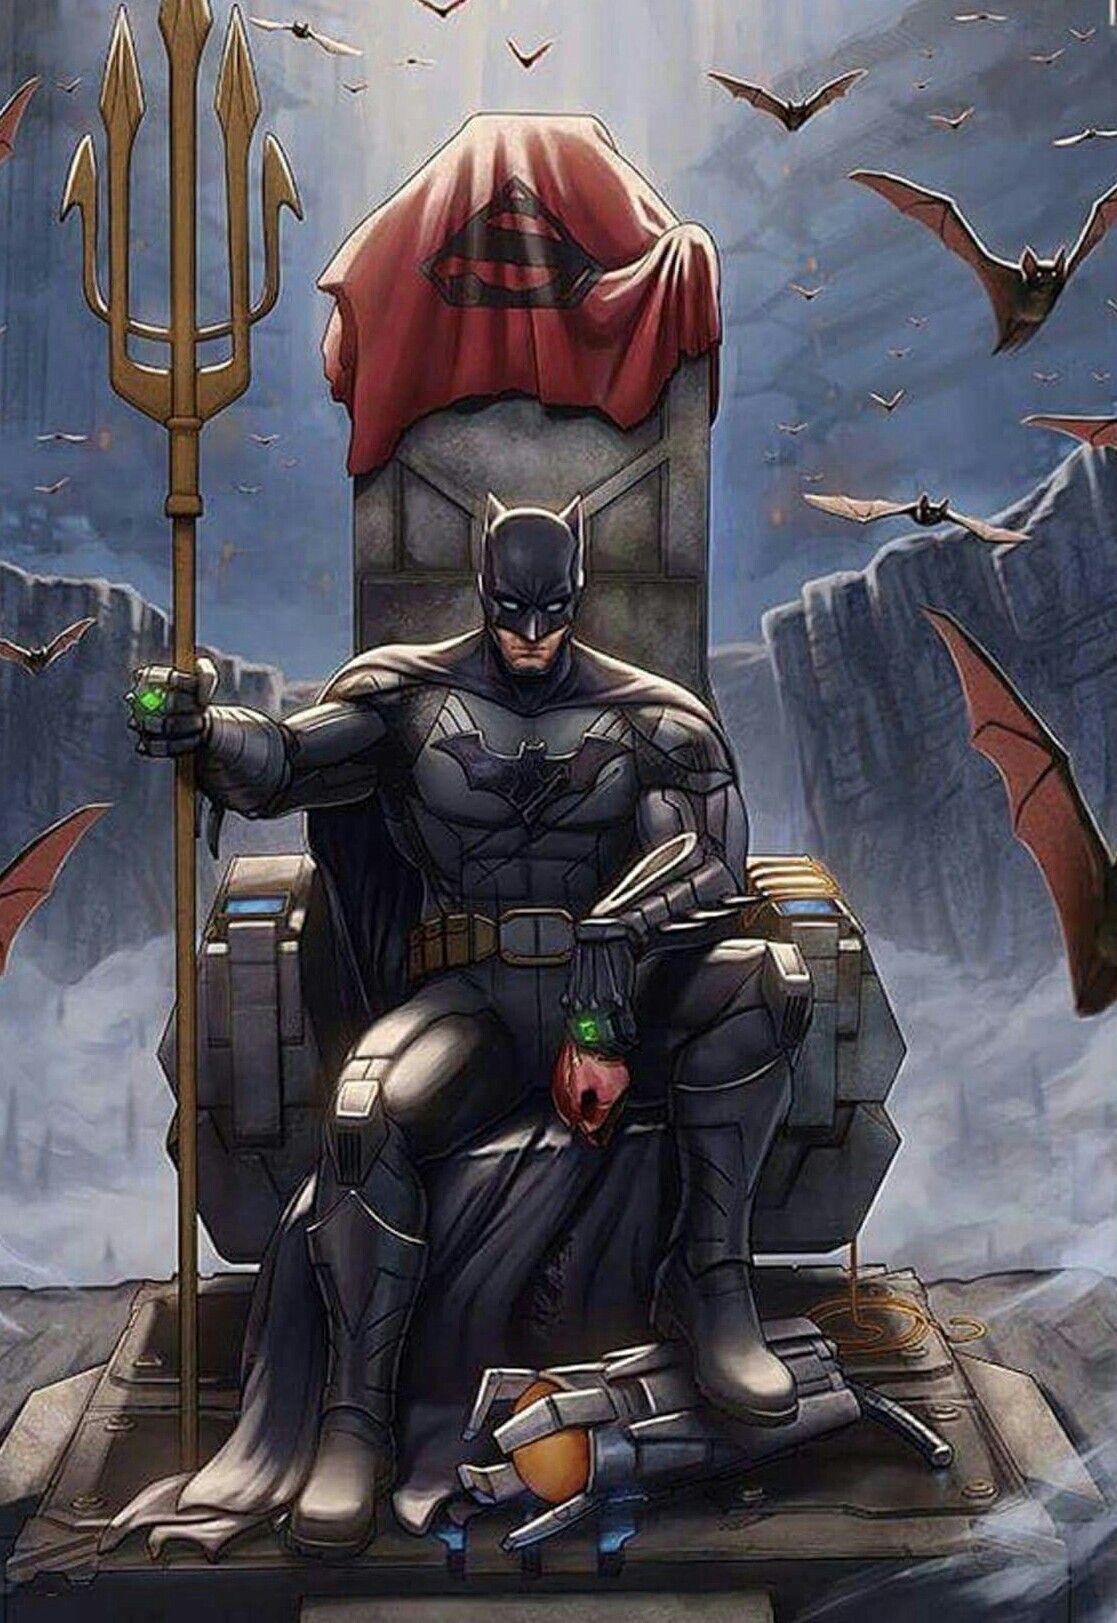 Most Badass Superhero Ever Planetdolan Batman Batman Comics Superhero